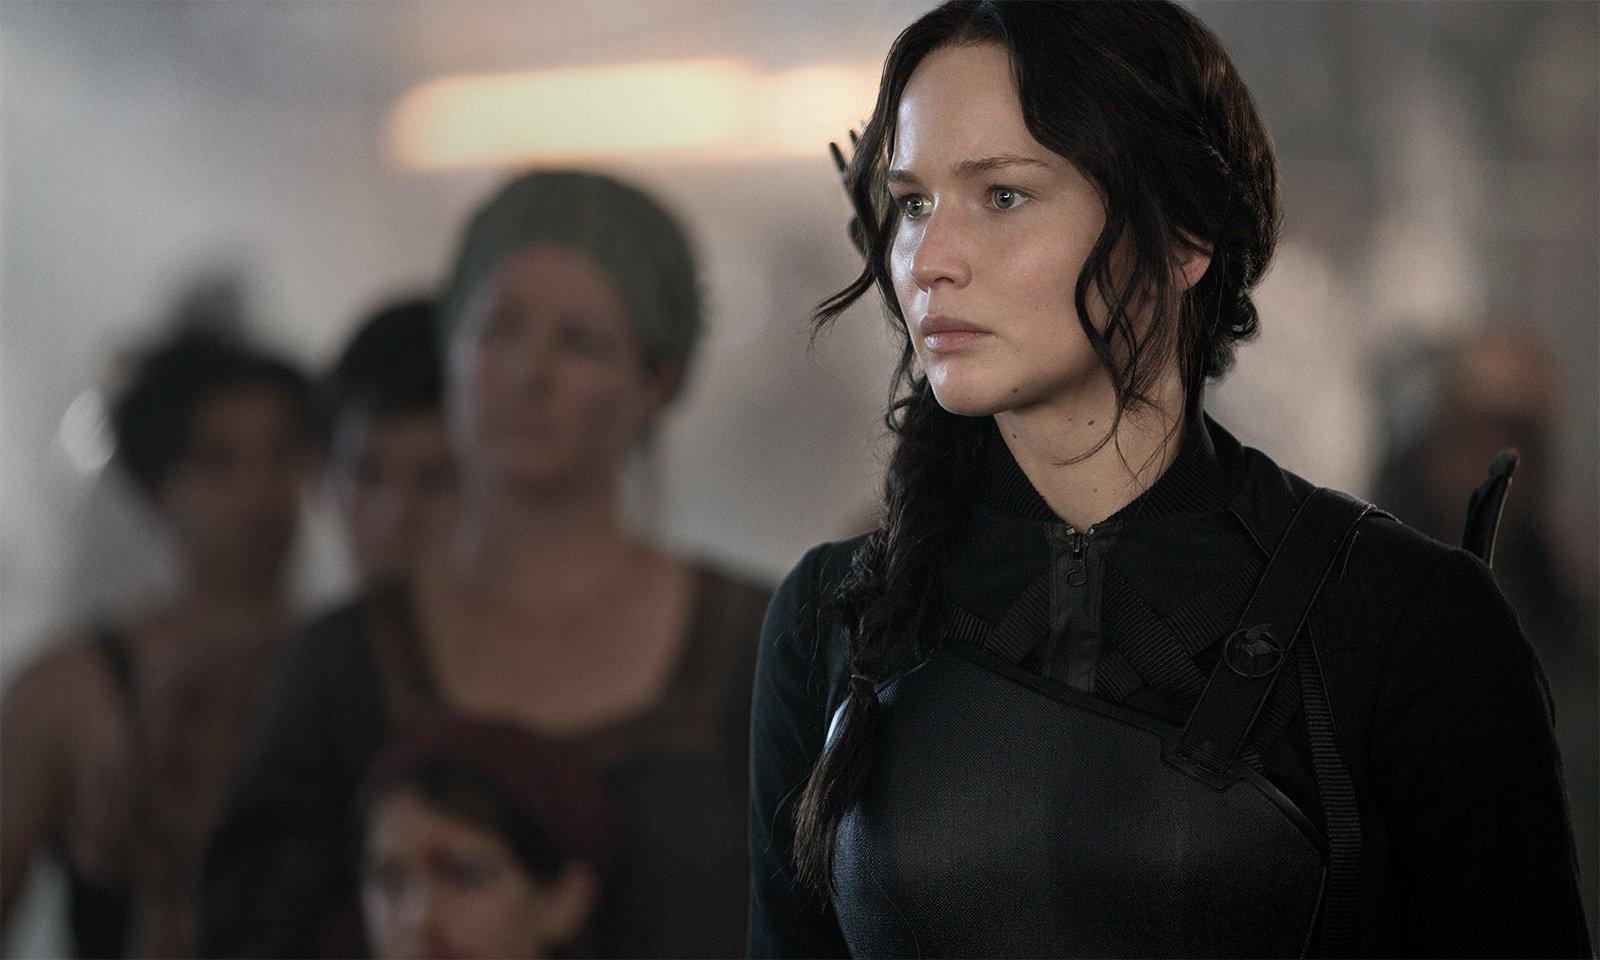 Jennifer-Lawrence-The-Hunger-Games-Mockingjay-Part-1